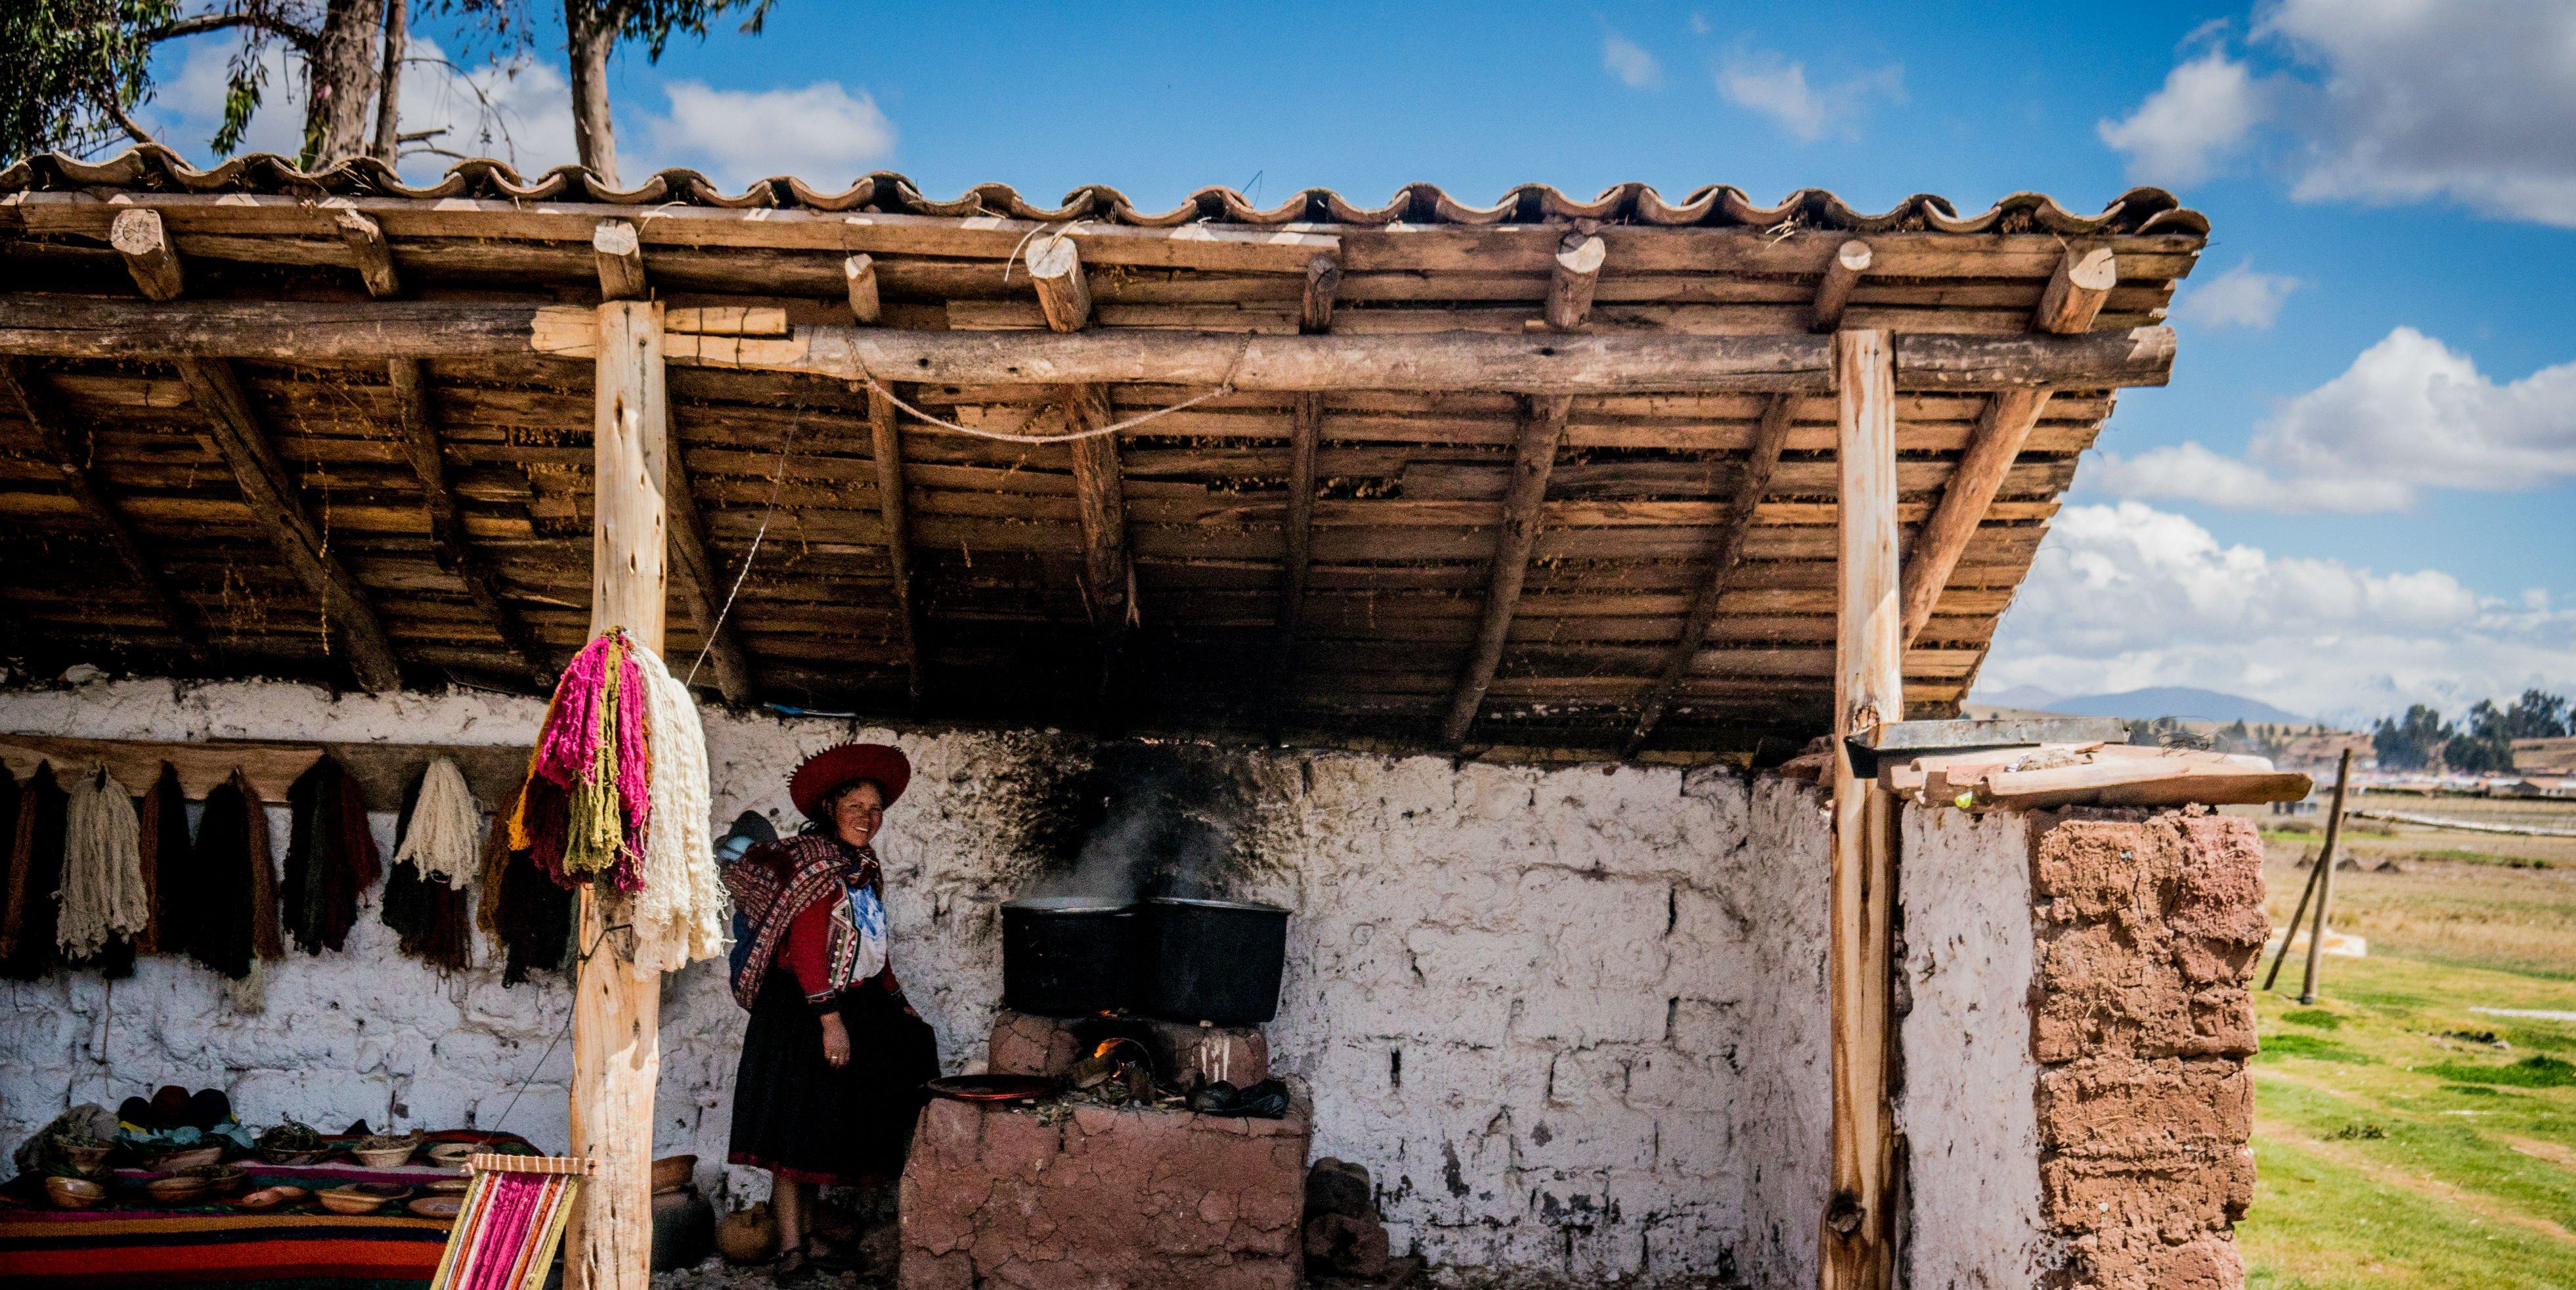 Latin American food culture